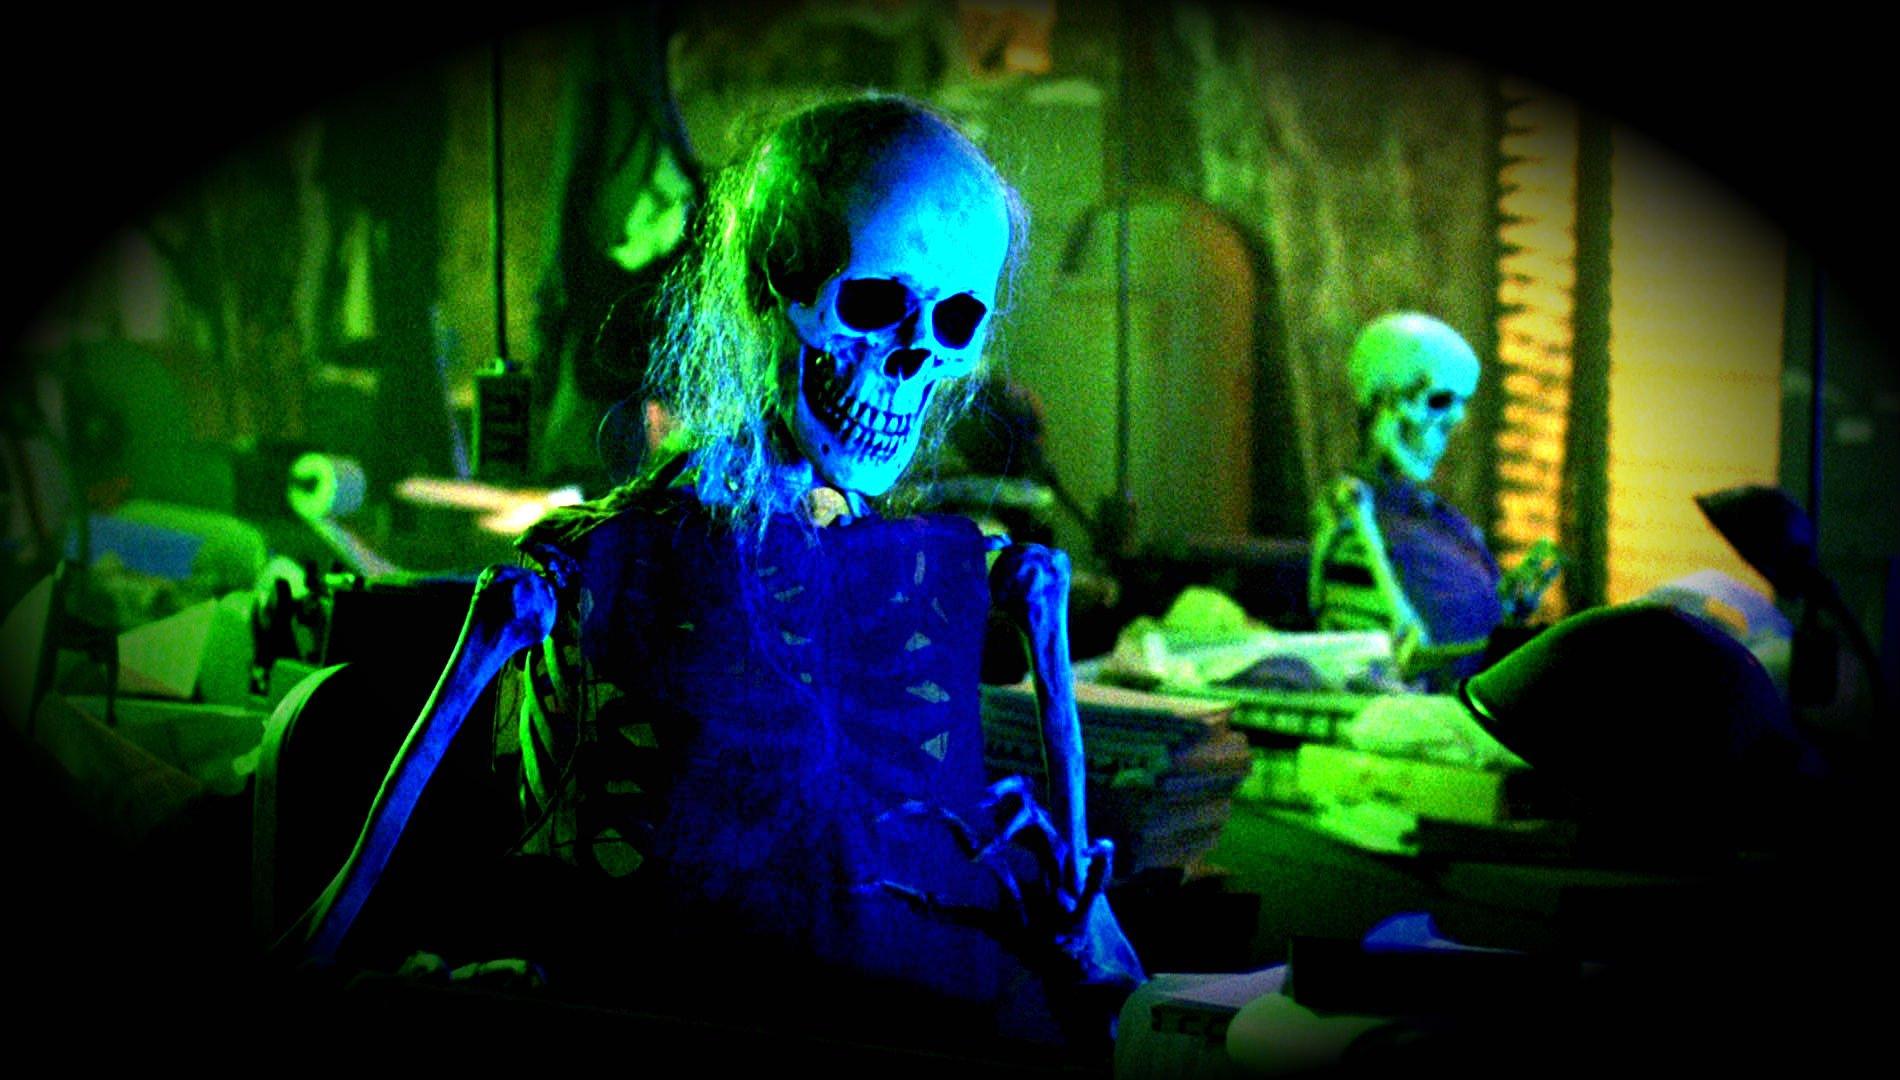 halloween skeleton wallpaper - photo #11